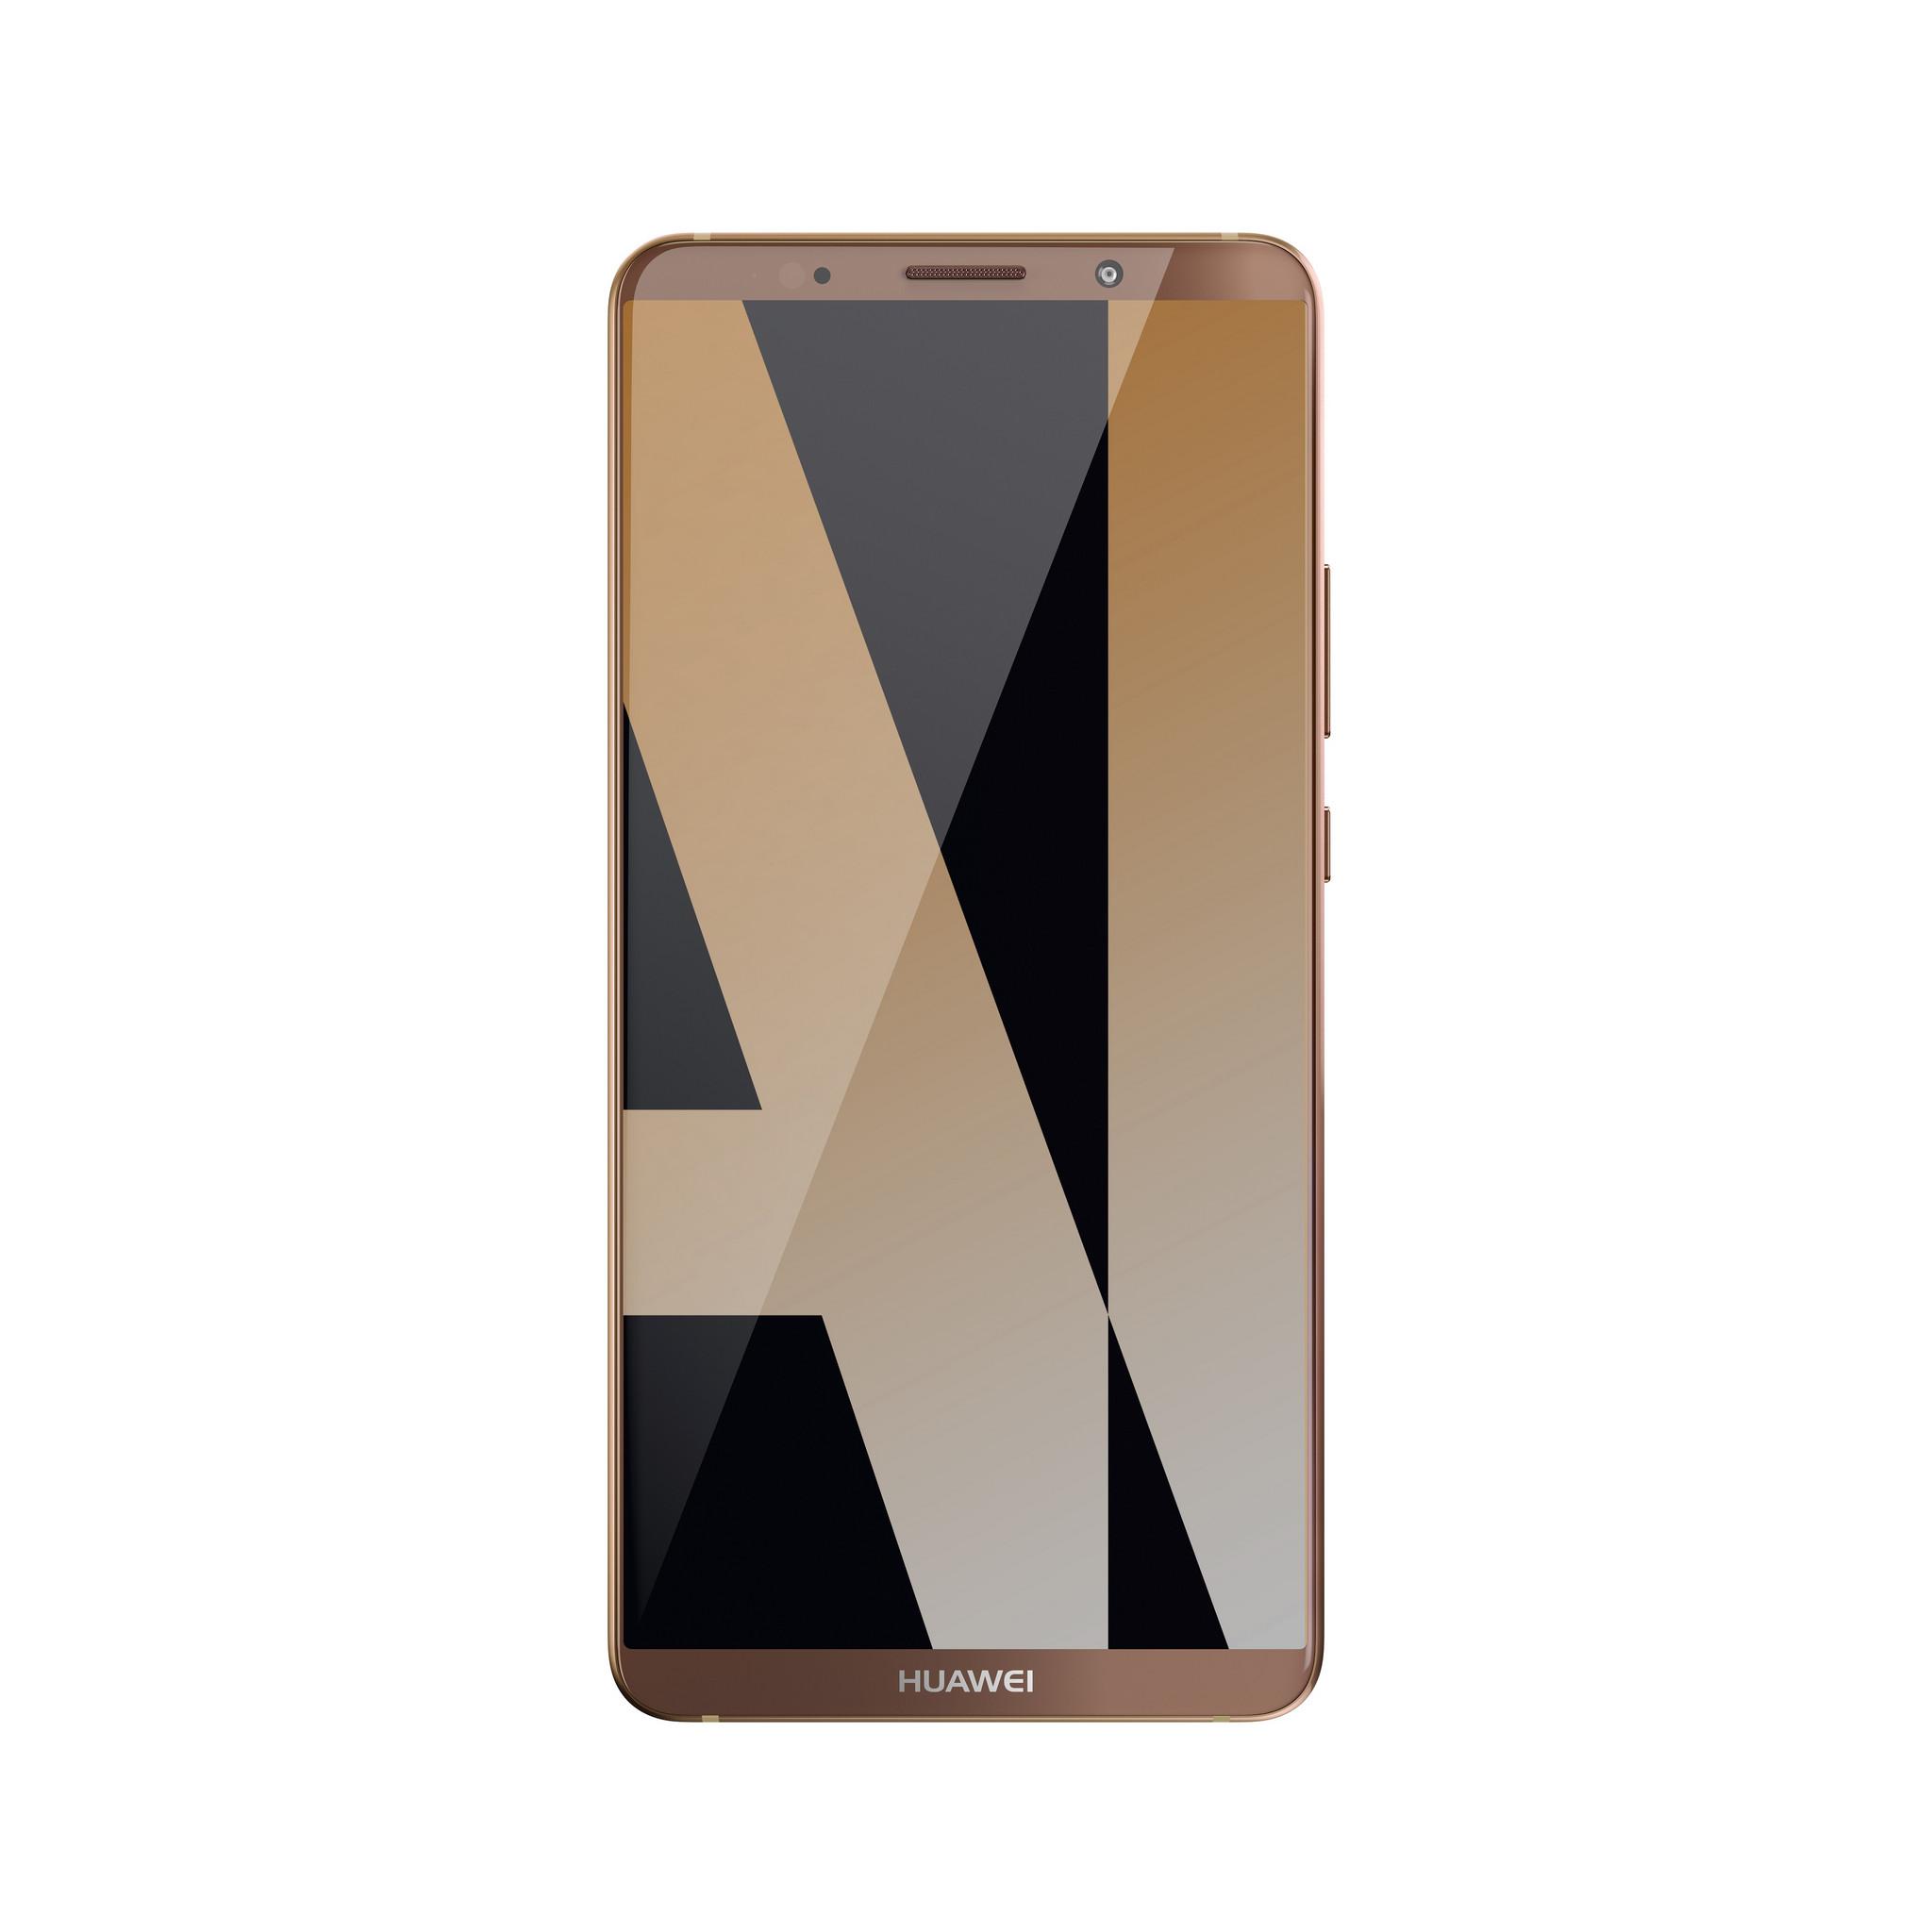 Huawei Mate 10 Pro_Mocha Brown_Front_lr.jpg